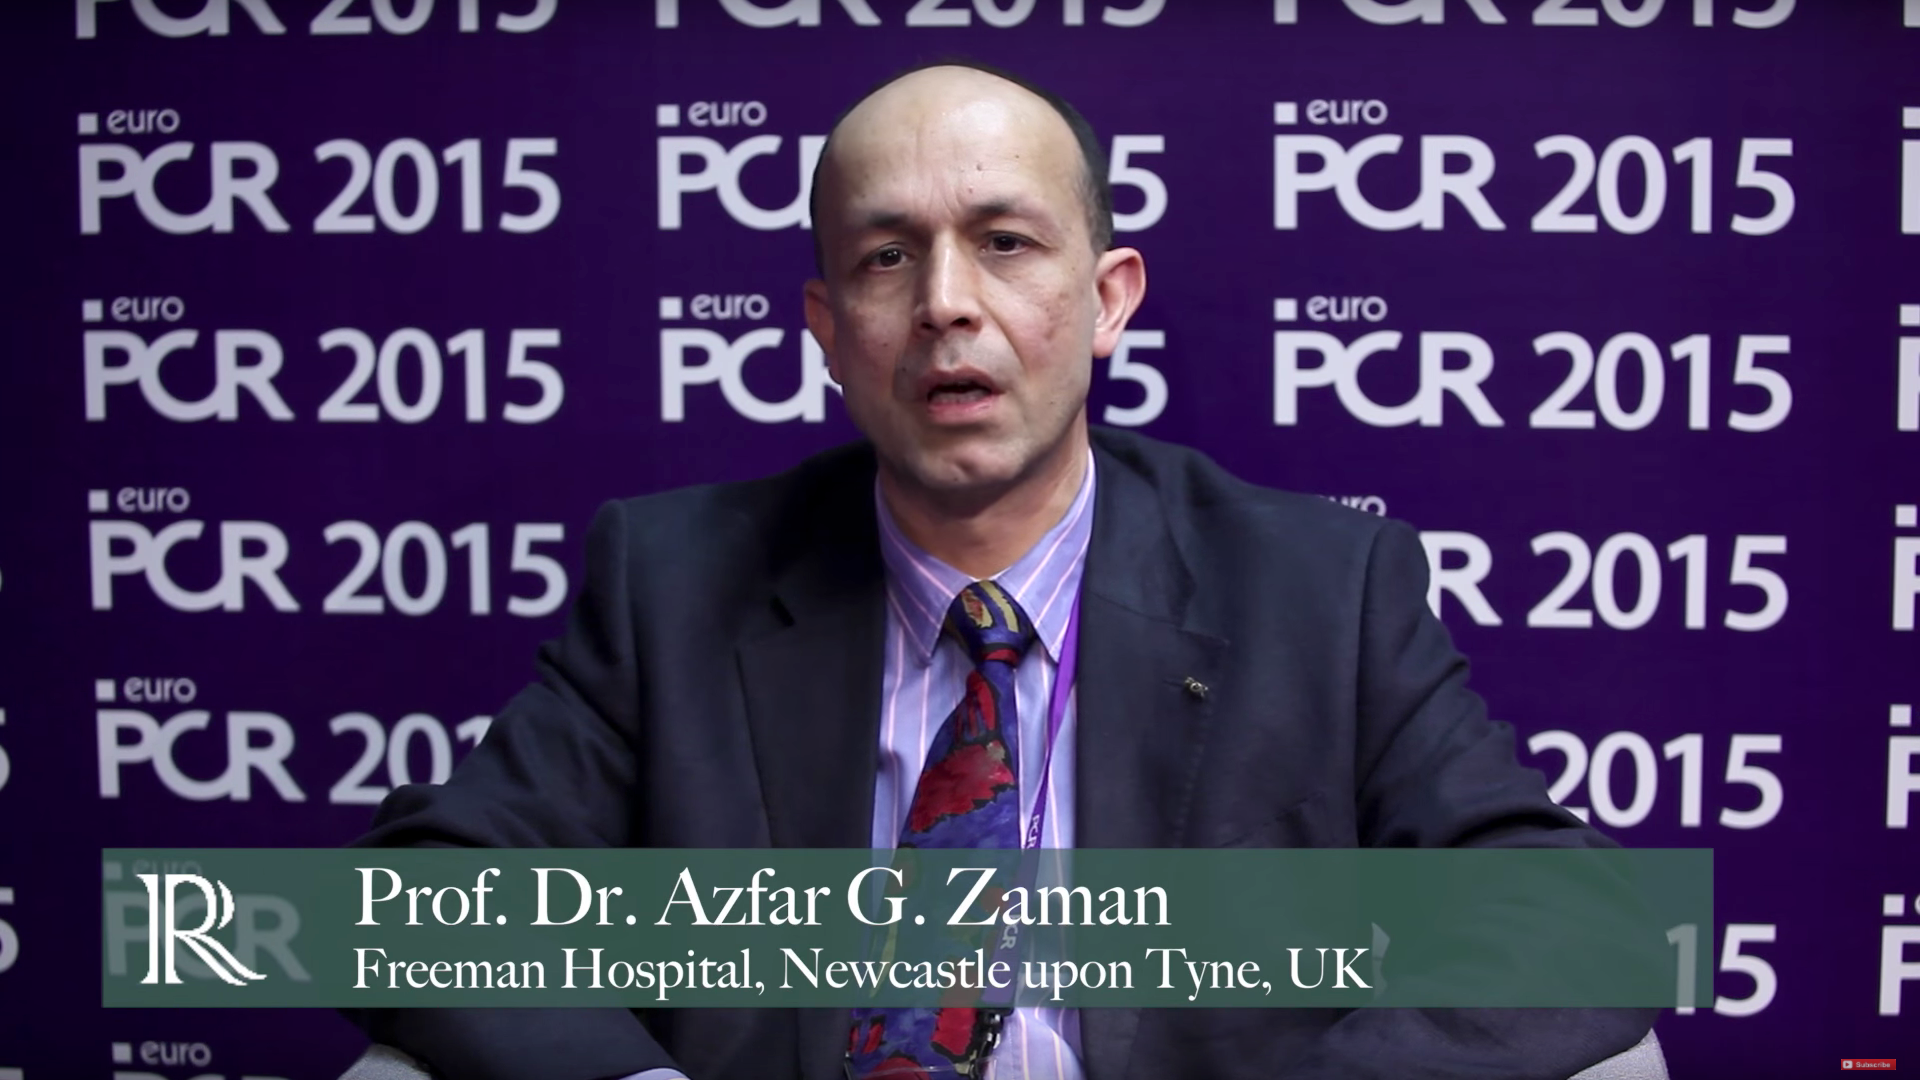 EuroPCR 2015: Pressure-controlled Intermittent Coronary Sinus Occlusion - AMI